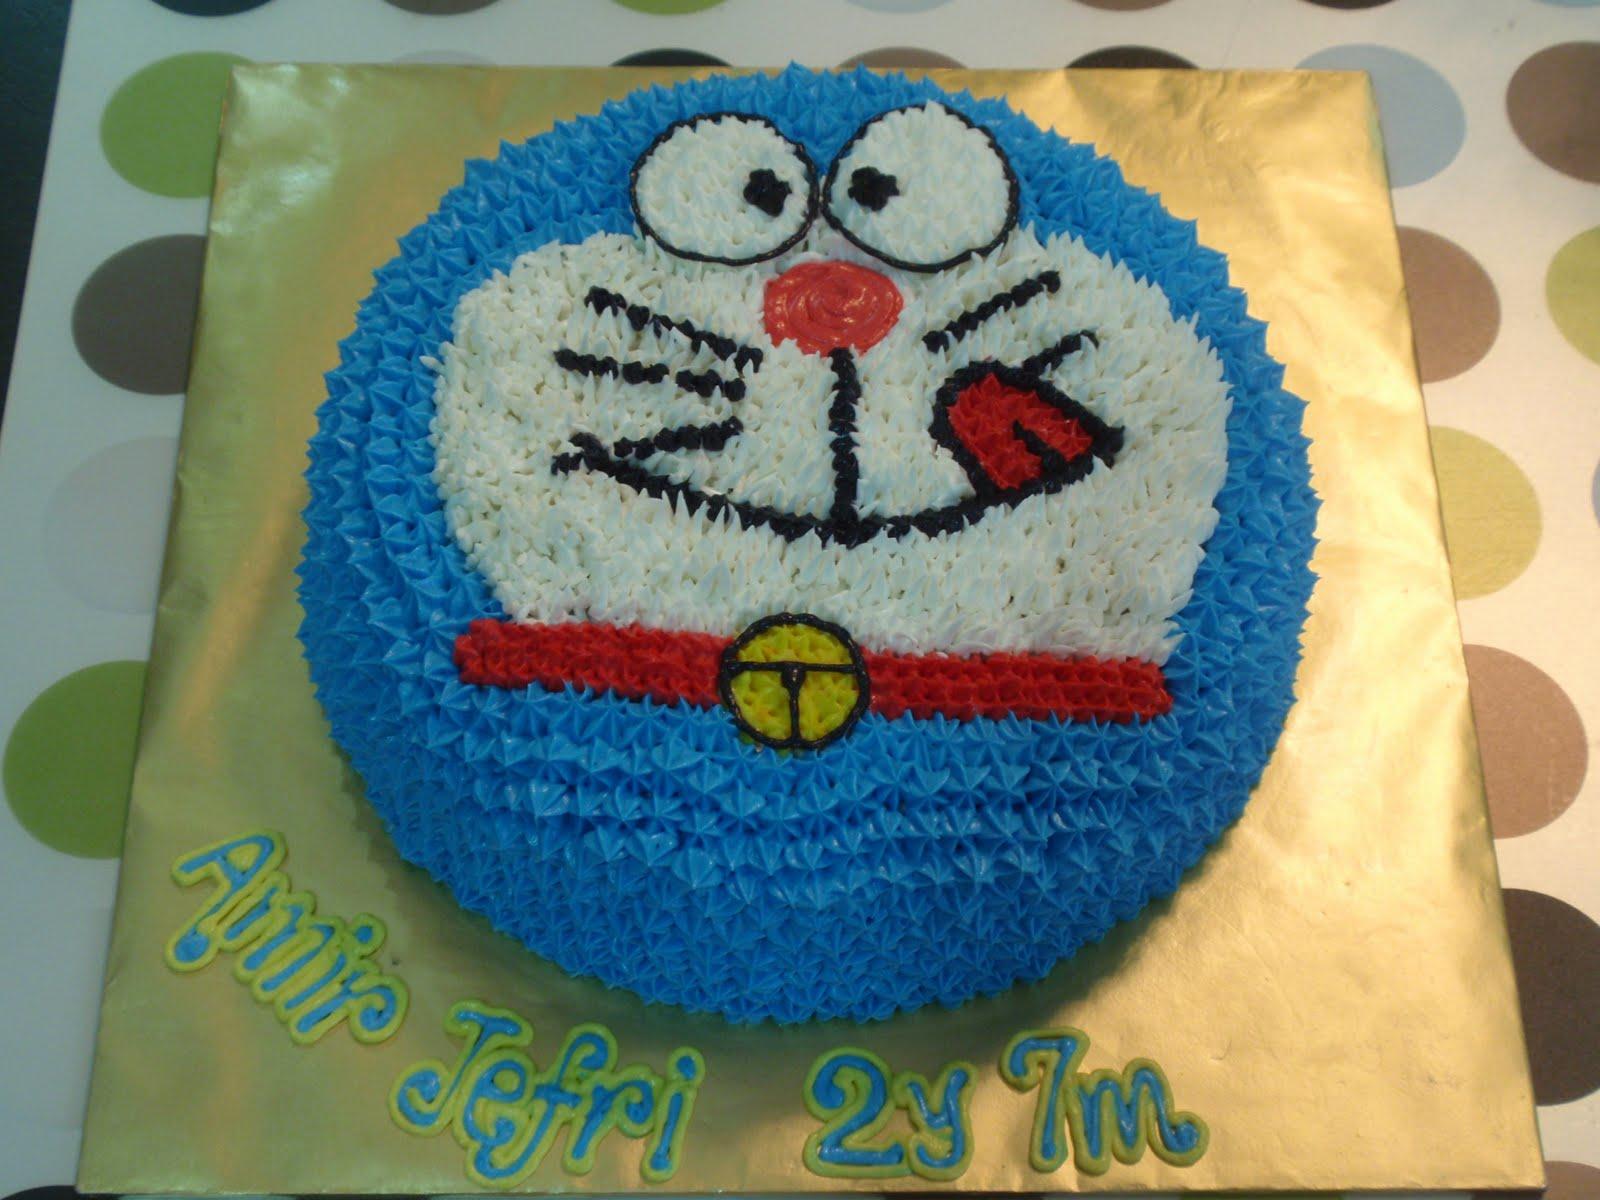 Doraemon Cake Design : Doraemon Cake